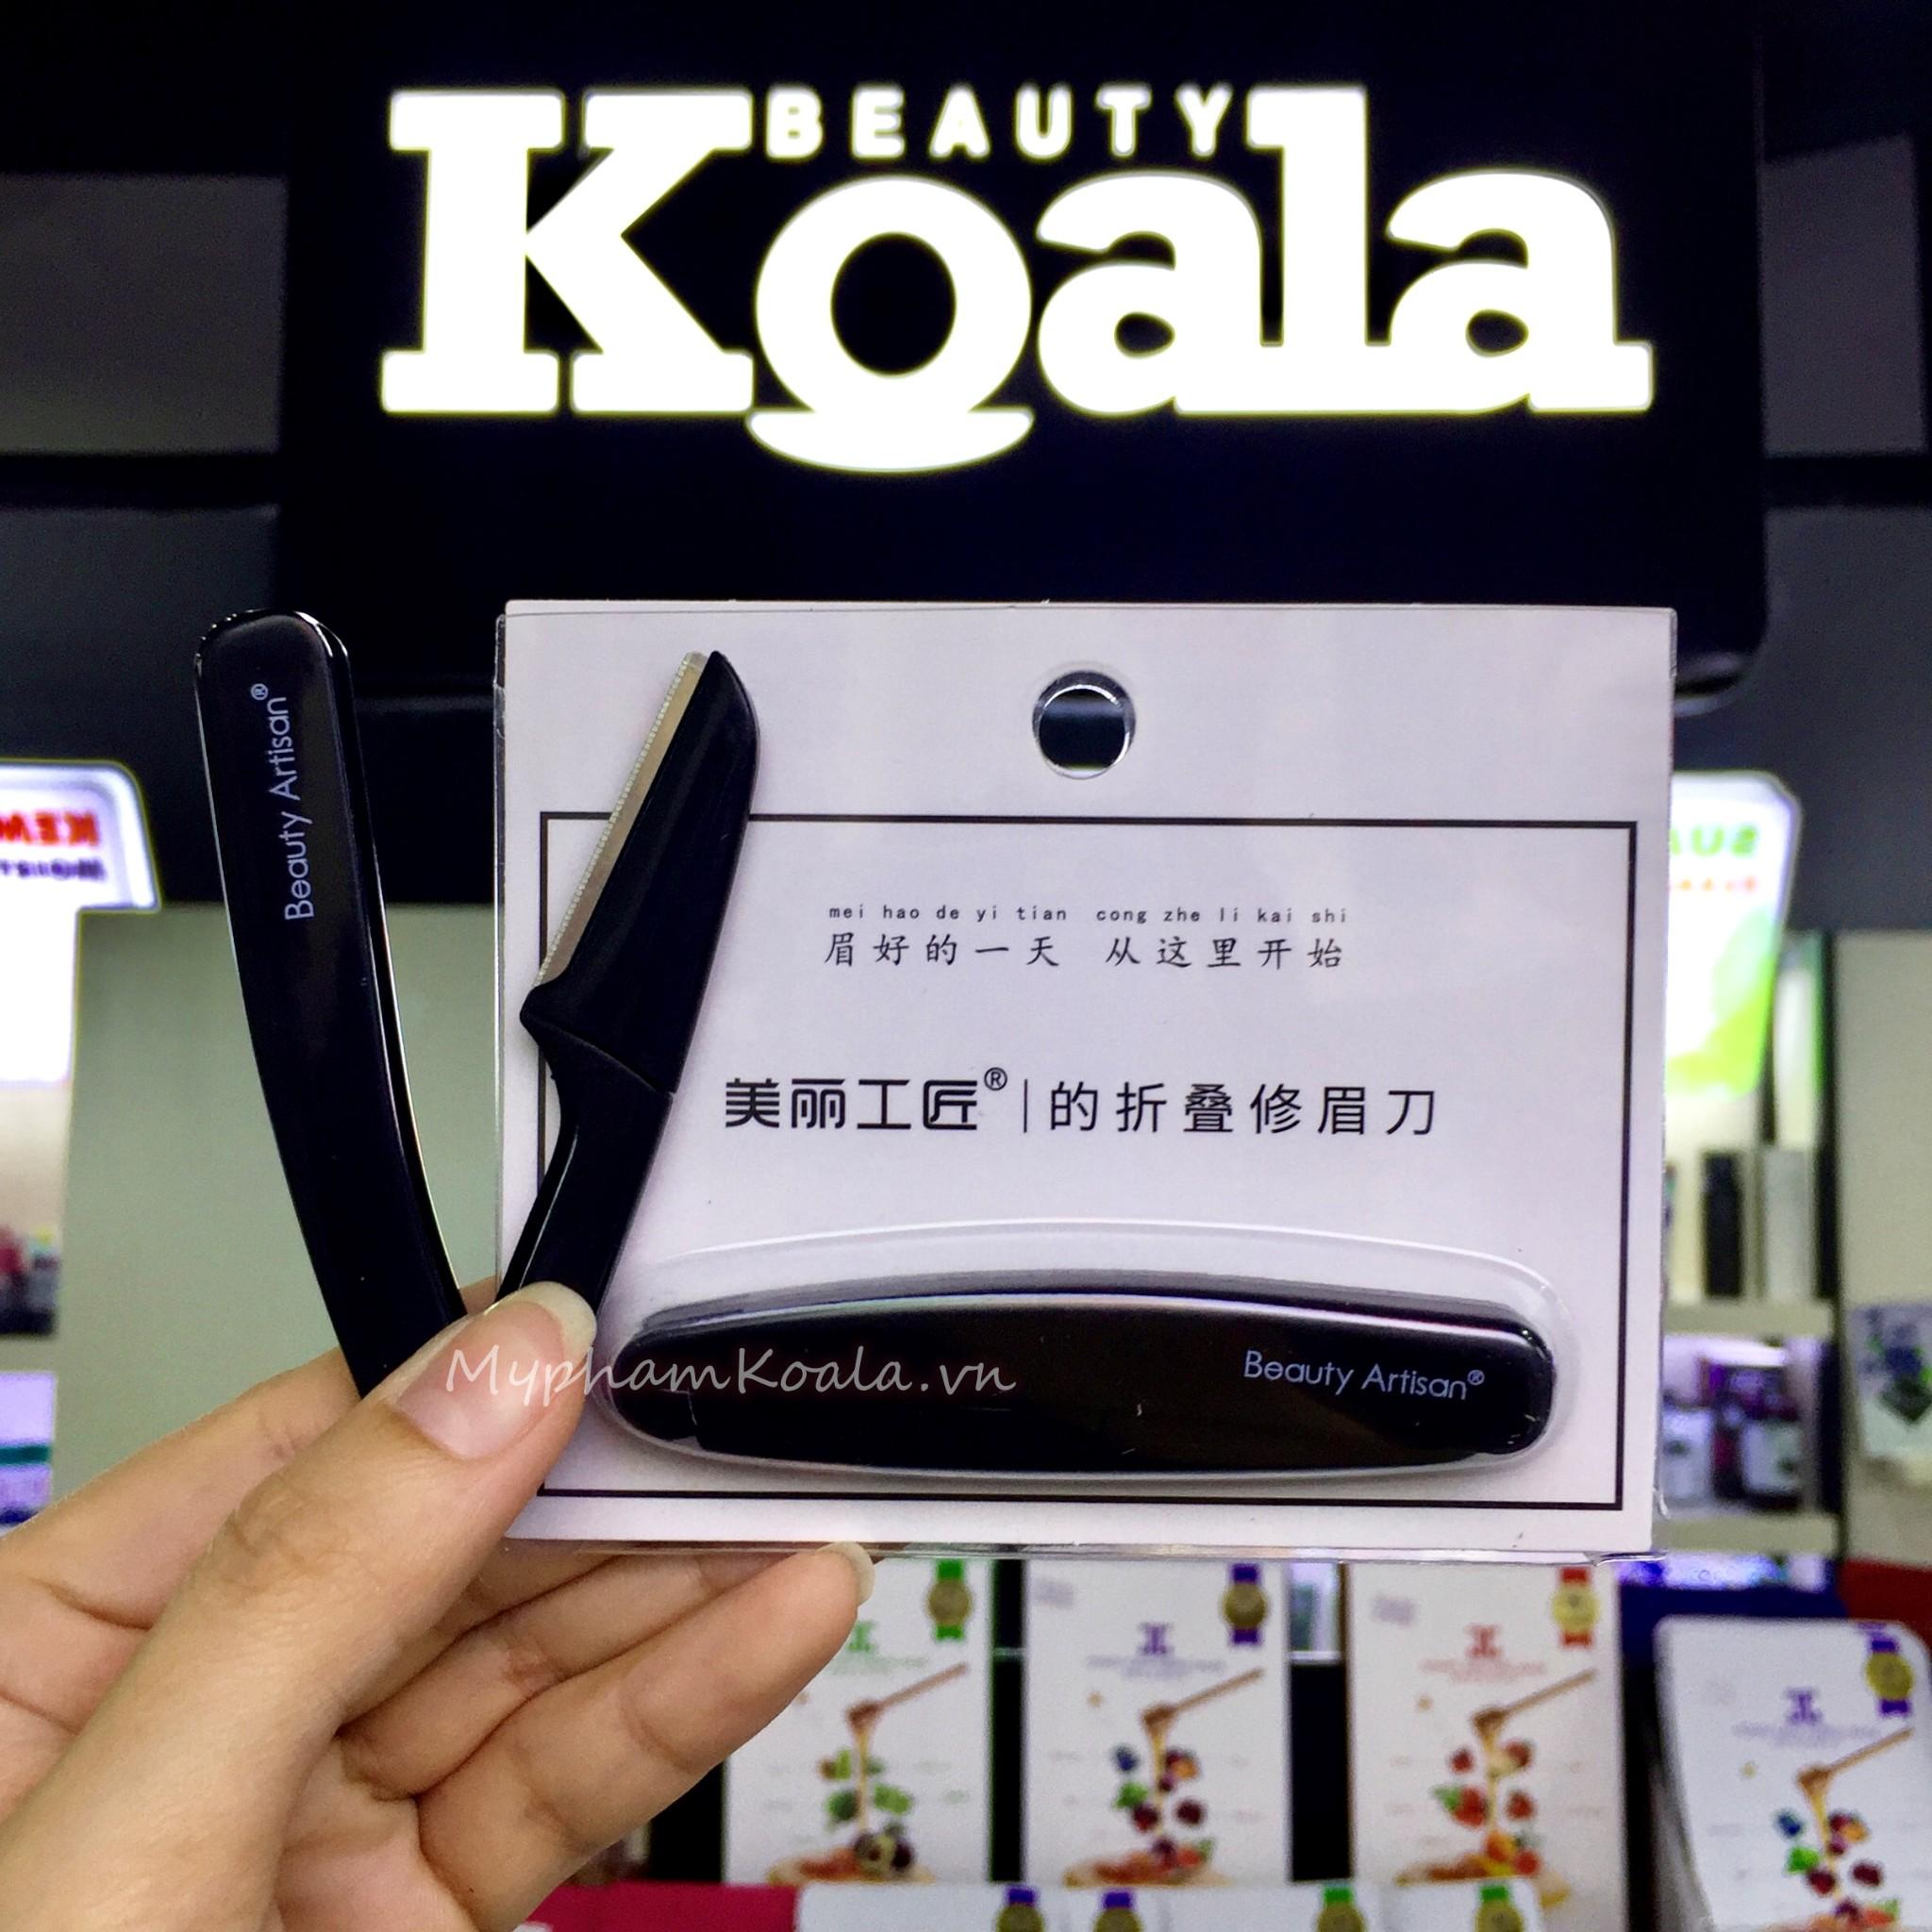 Dao Cao Lông Mày Beauty Artis